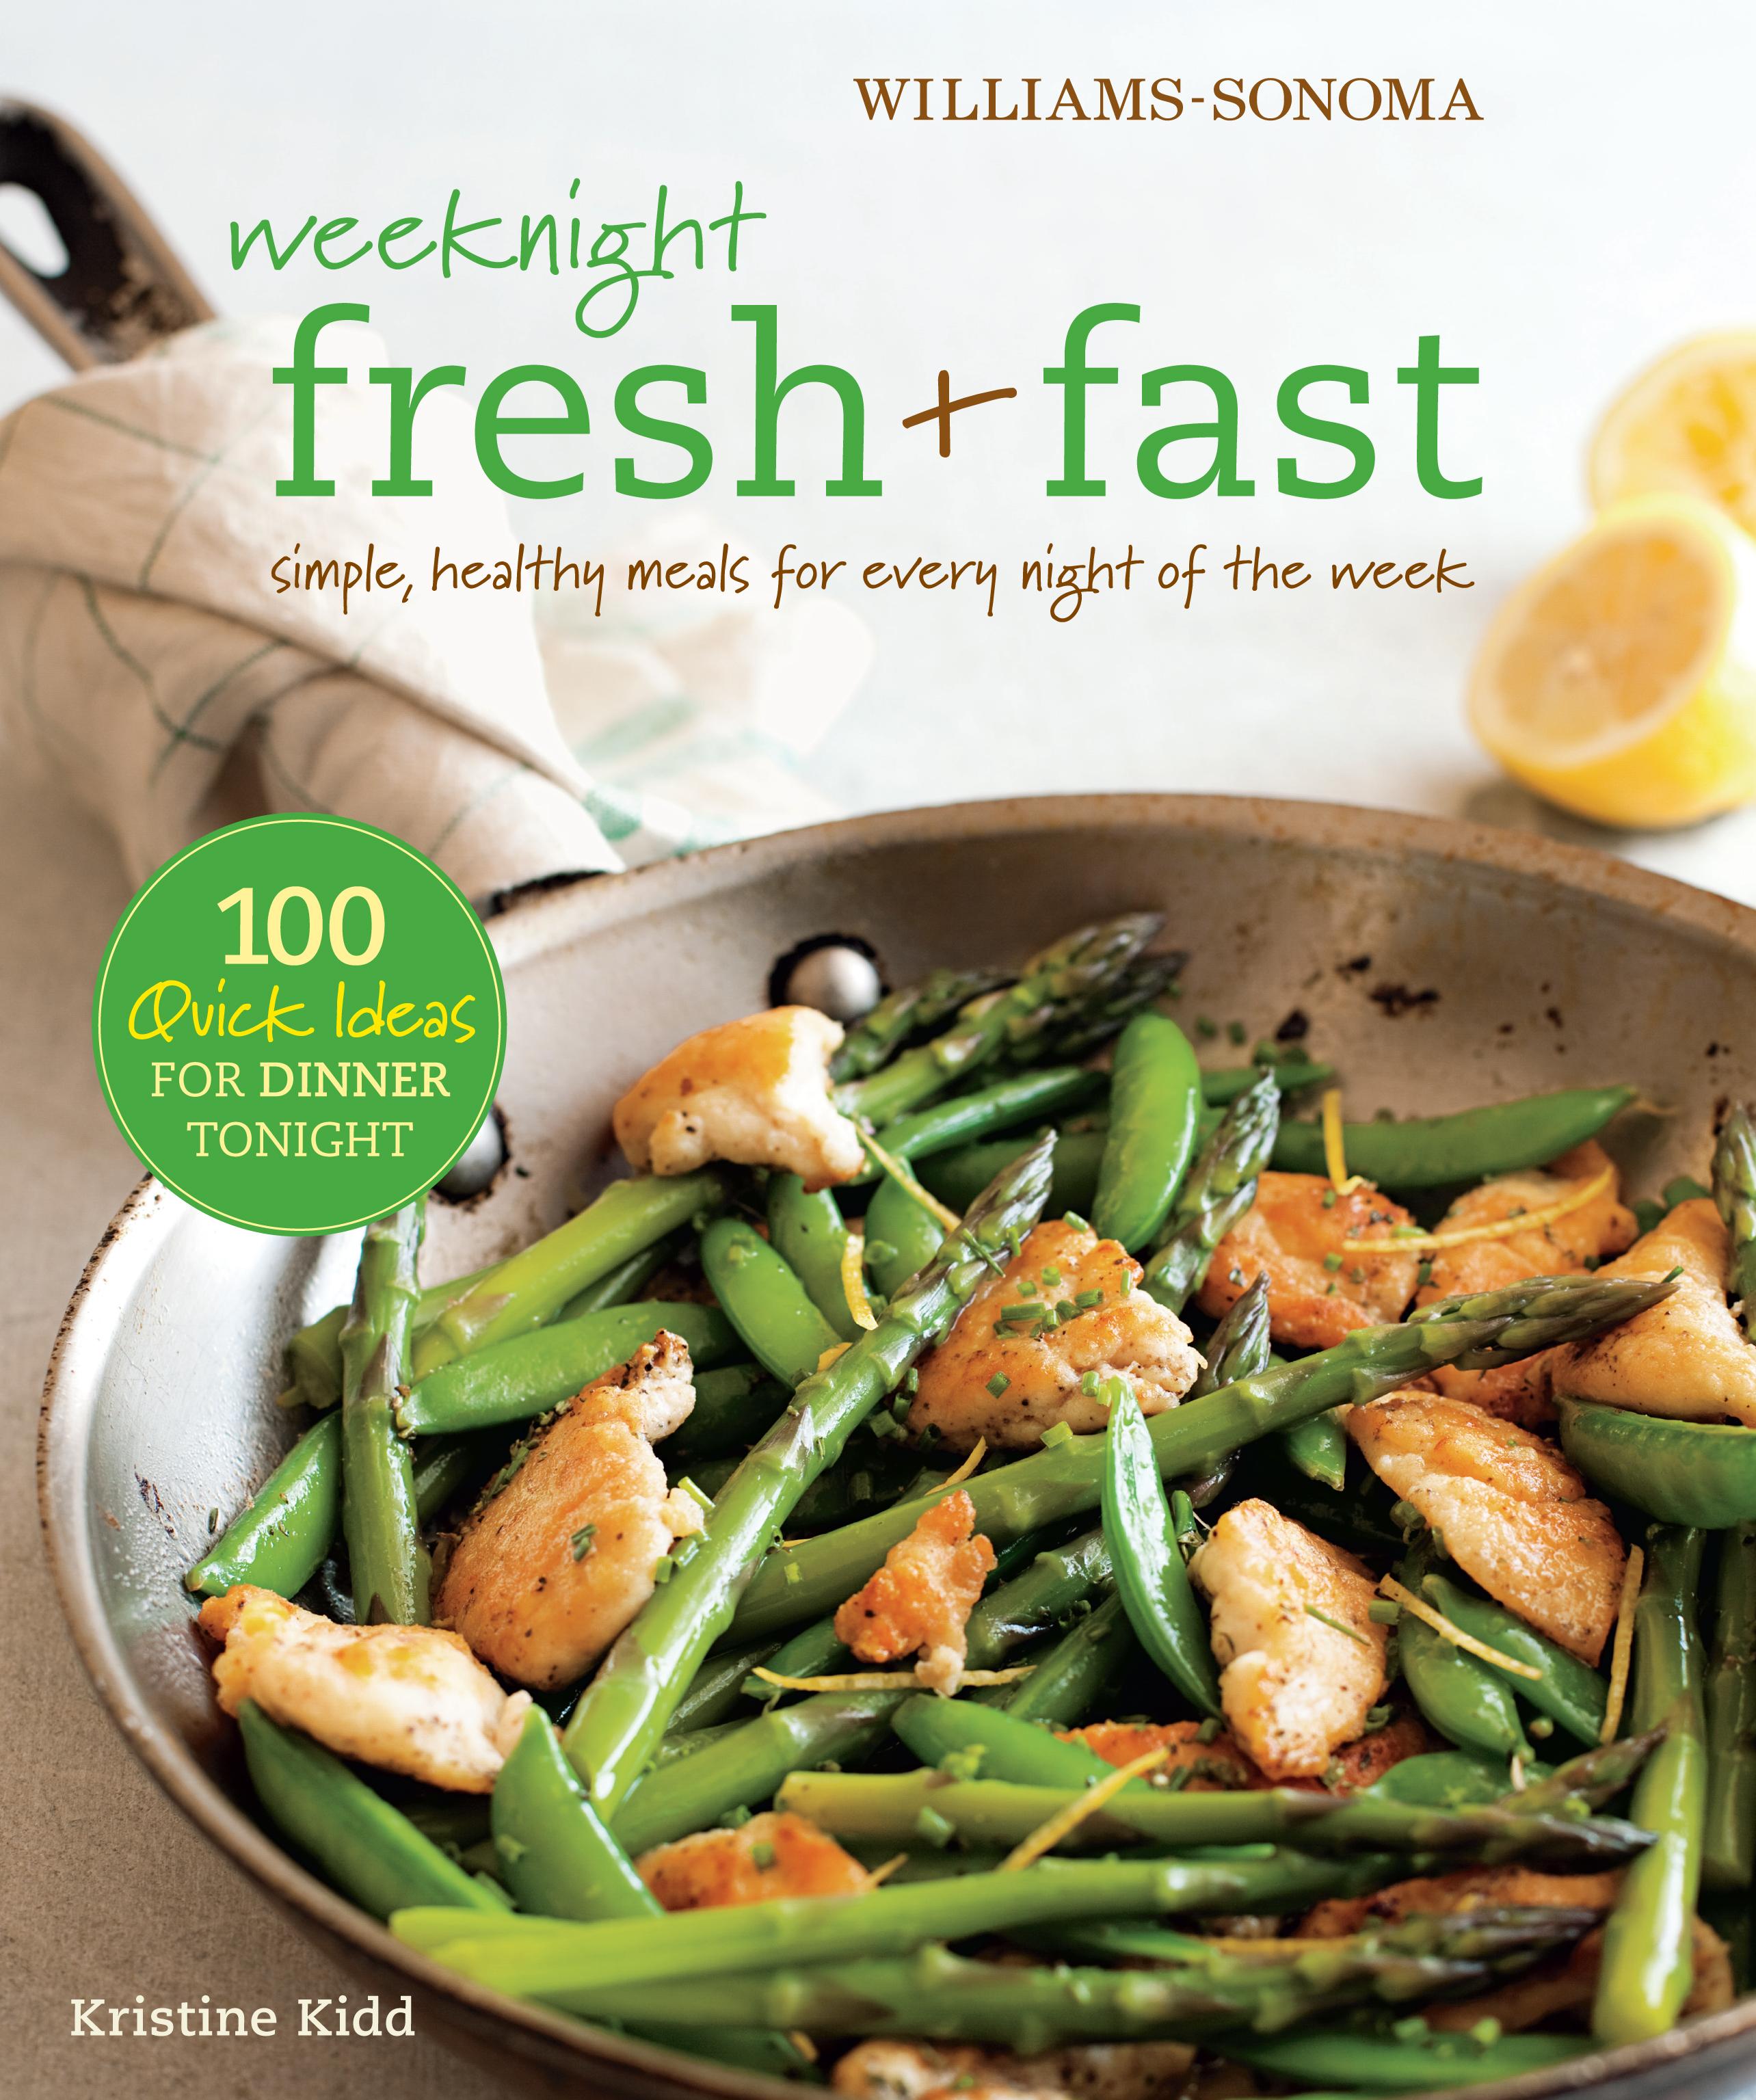 Weeknight Fresh Fast Williams Sonoma Book By Kristine Kidd